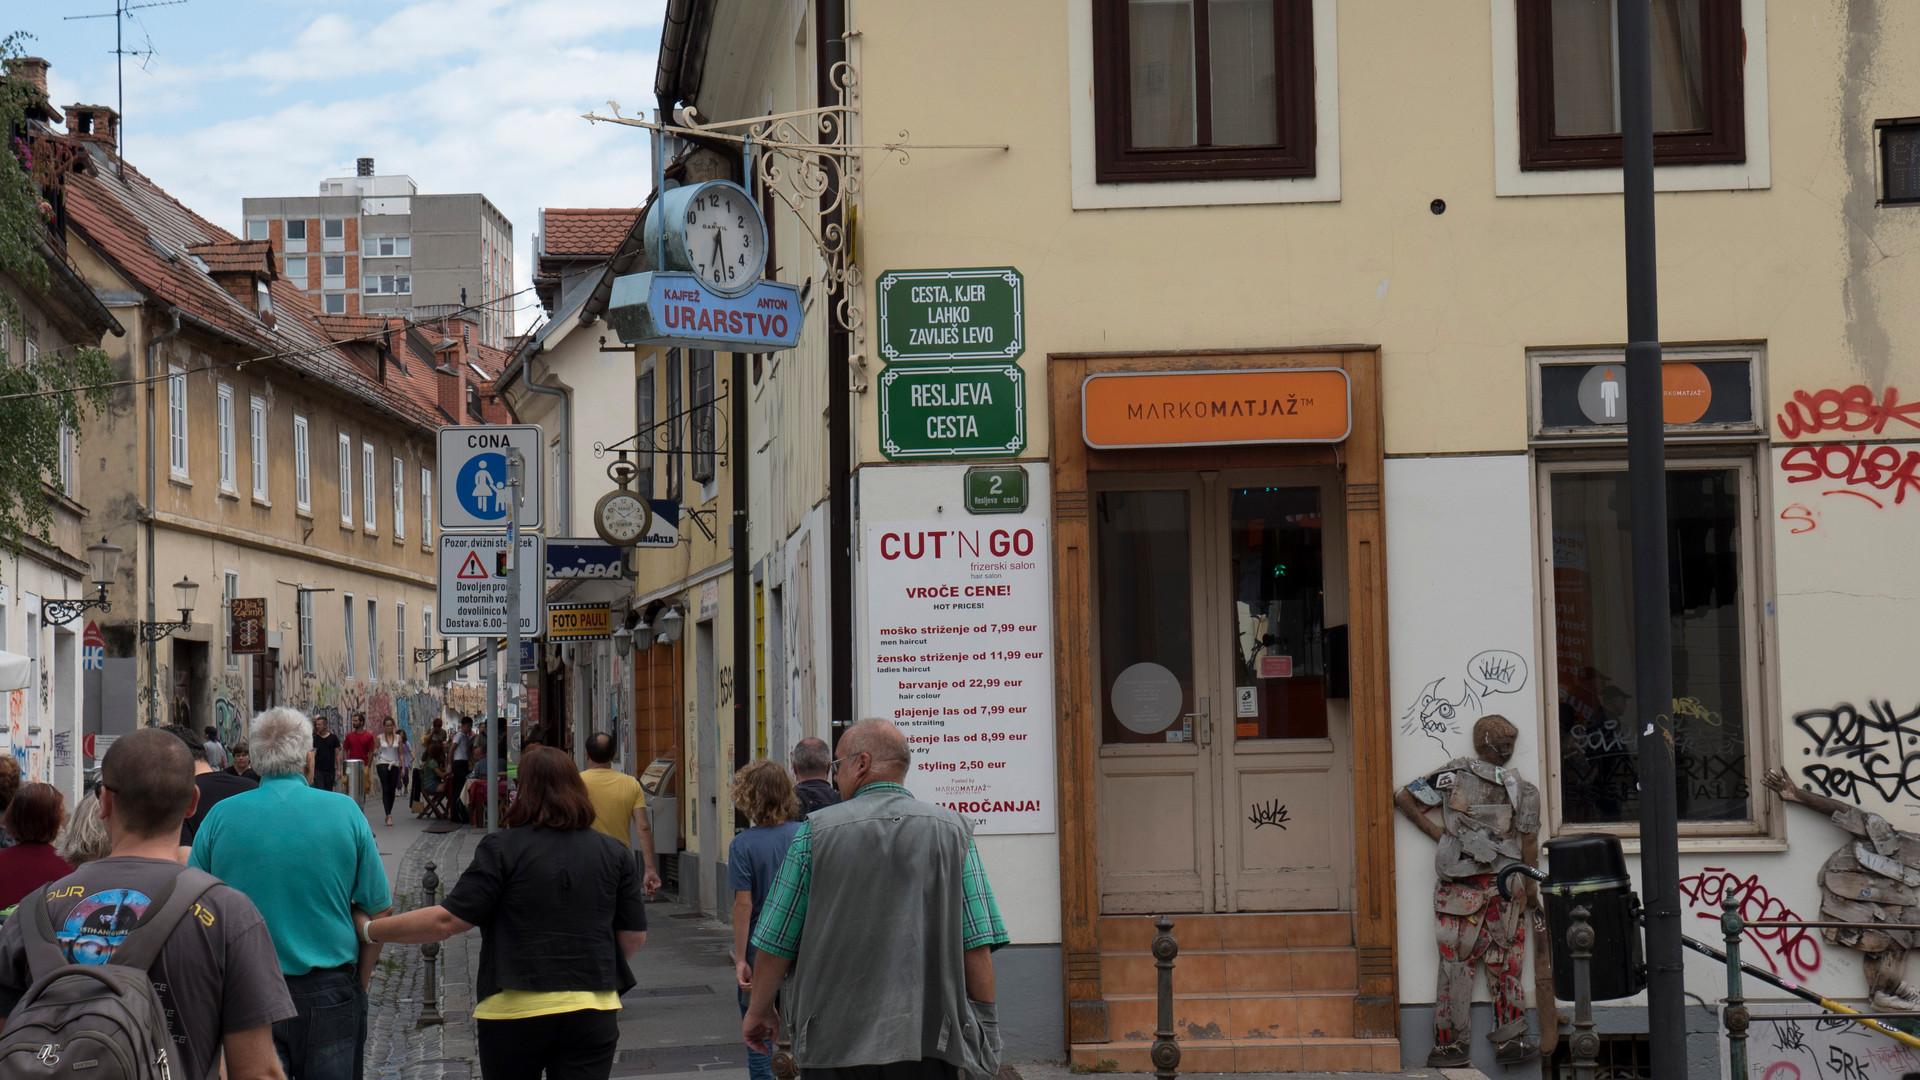 Re-street Ljubljana_byjacobsennek 01.JPG